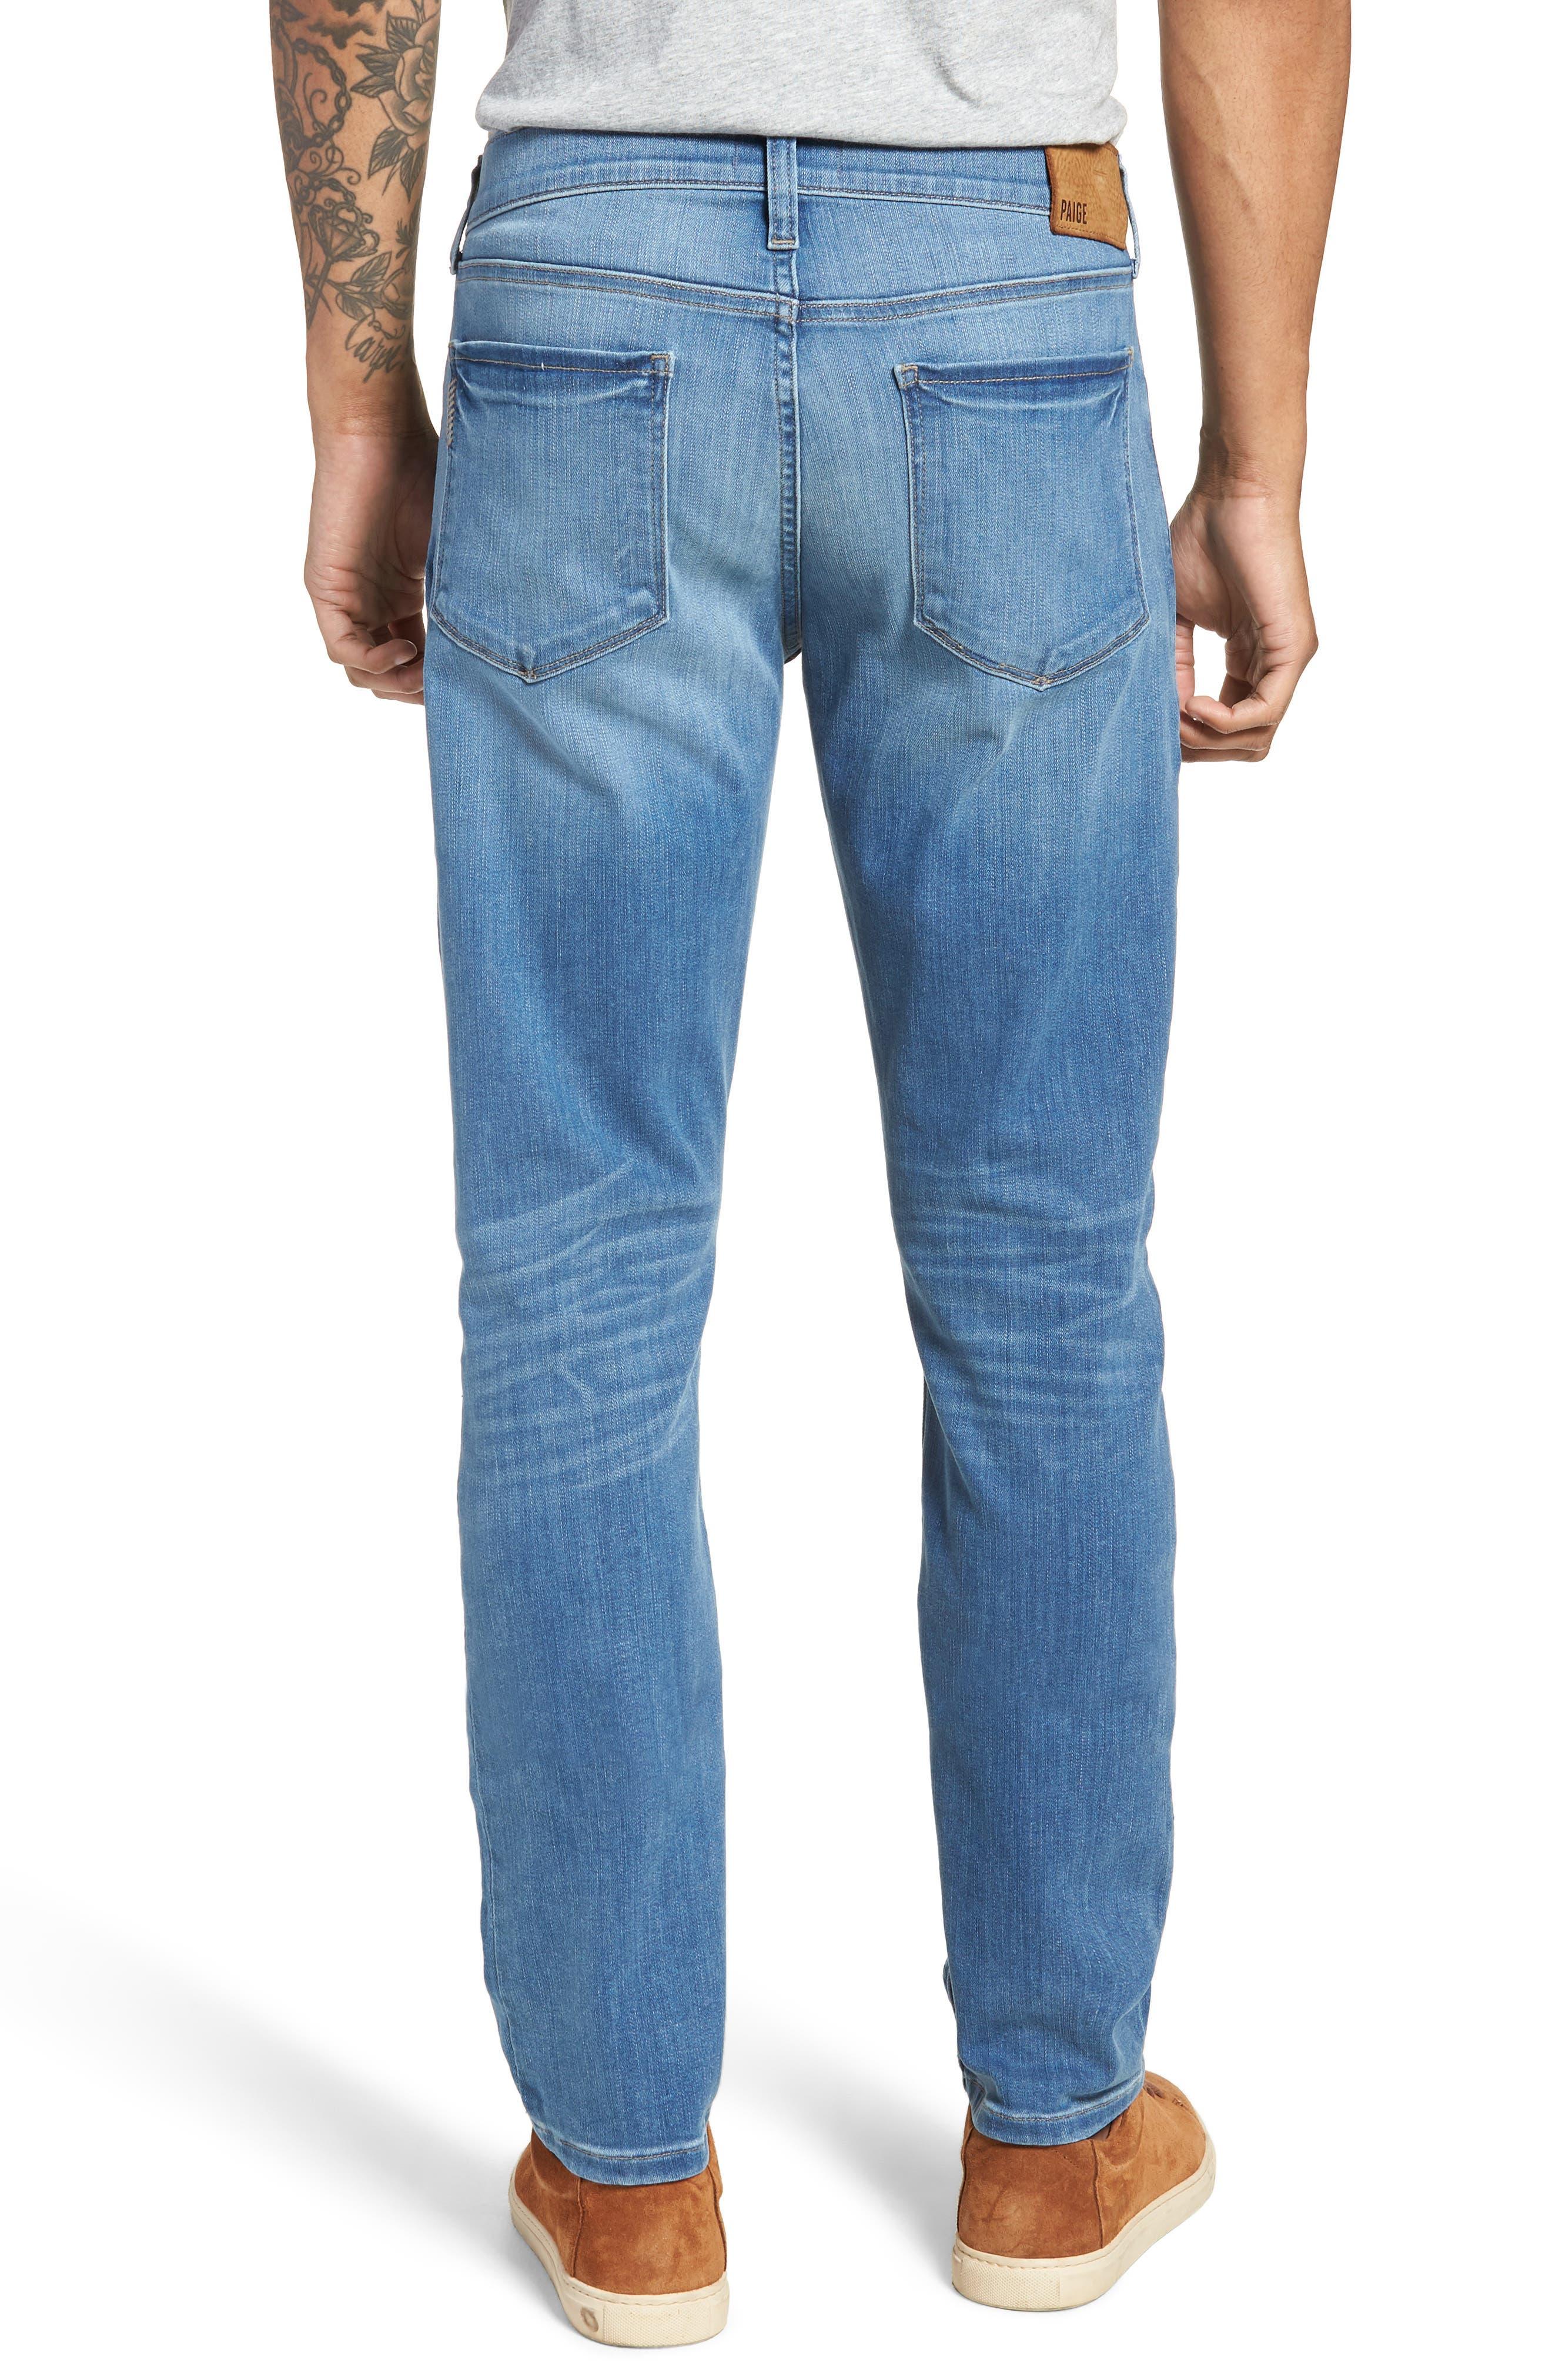 Transcend - Federal Slim Straight Leg Jeans,                             Alternate thumbnail 2, color,                             Hammonds